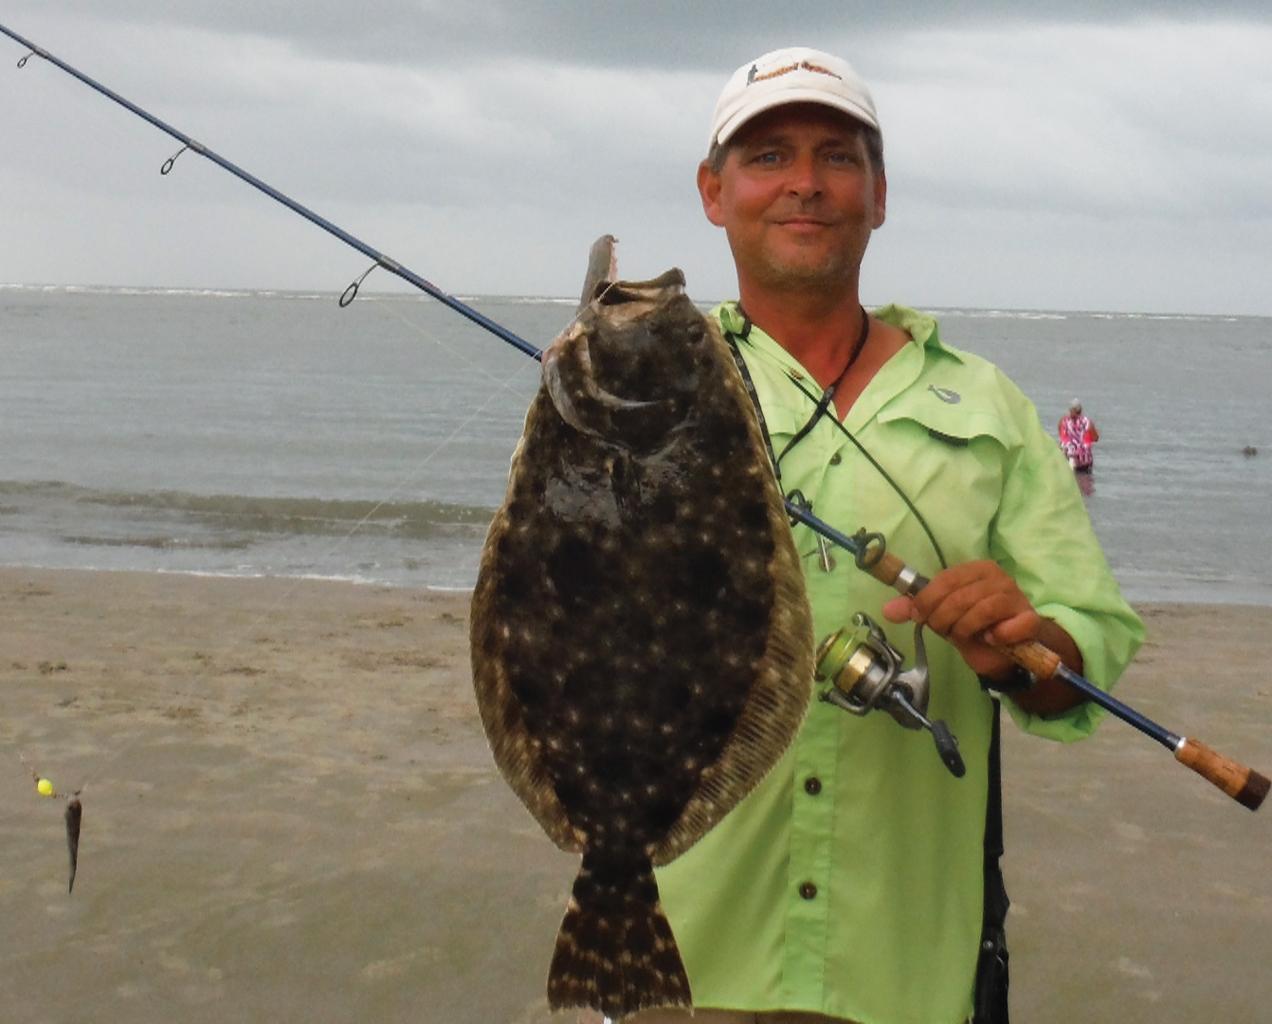 Surf fishing coastal angler the angler magazine for Flounder rigs surf fishing